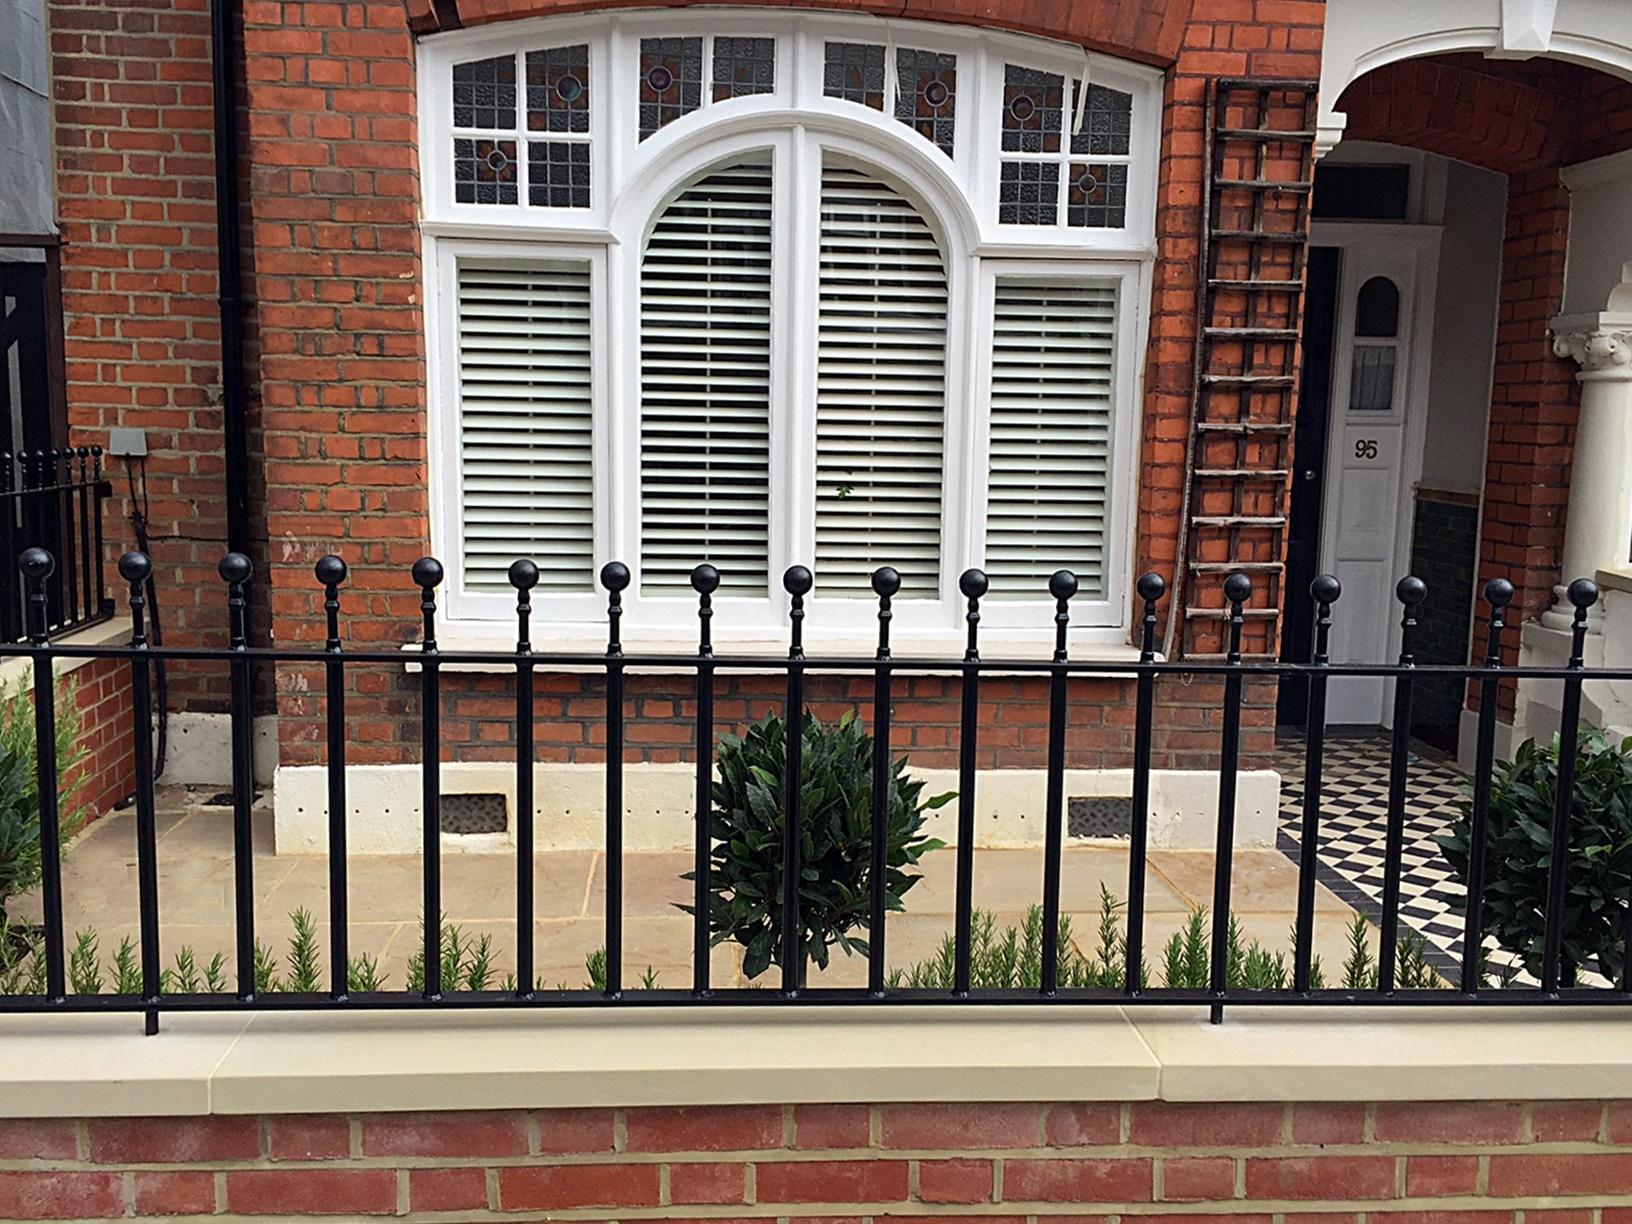 Low maintenance cap coping red brick garden front wall metal gate rails plants London Balham Streatham Brixton Vauxhall